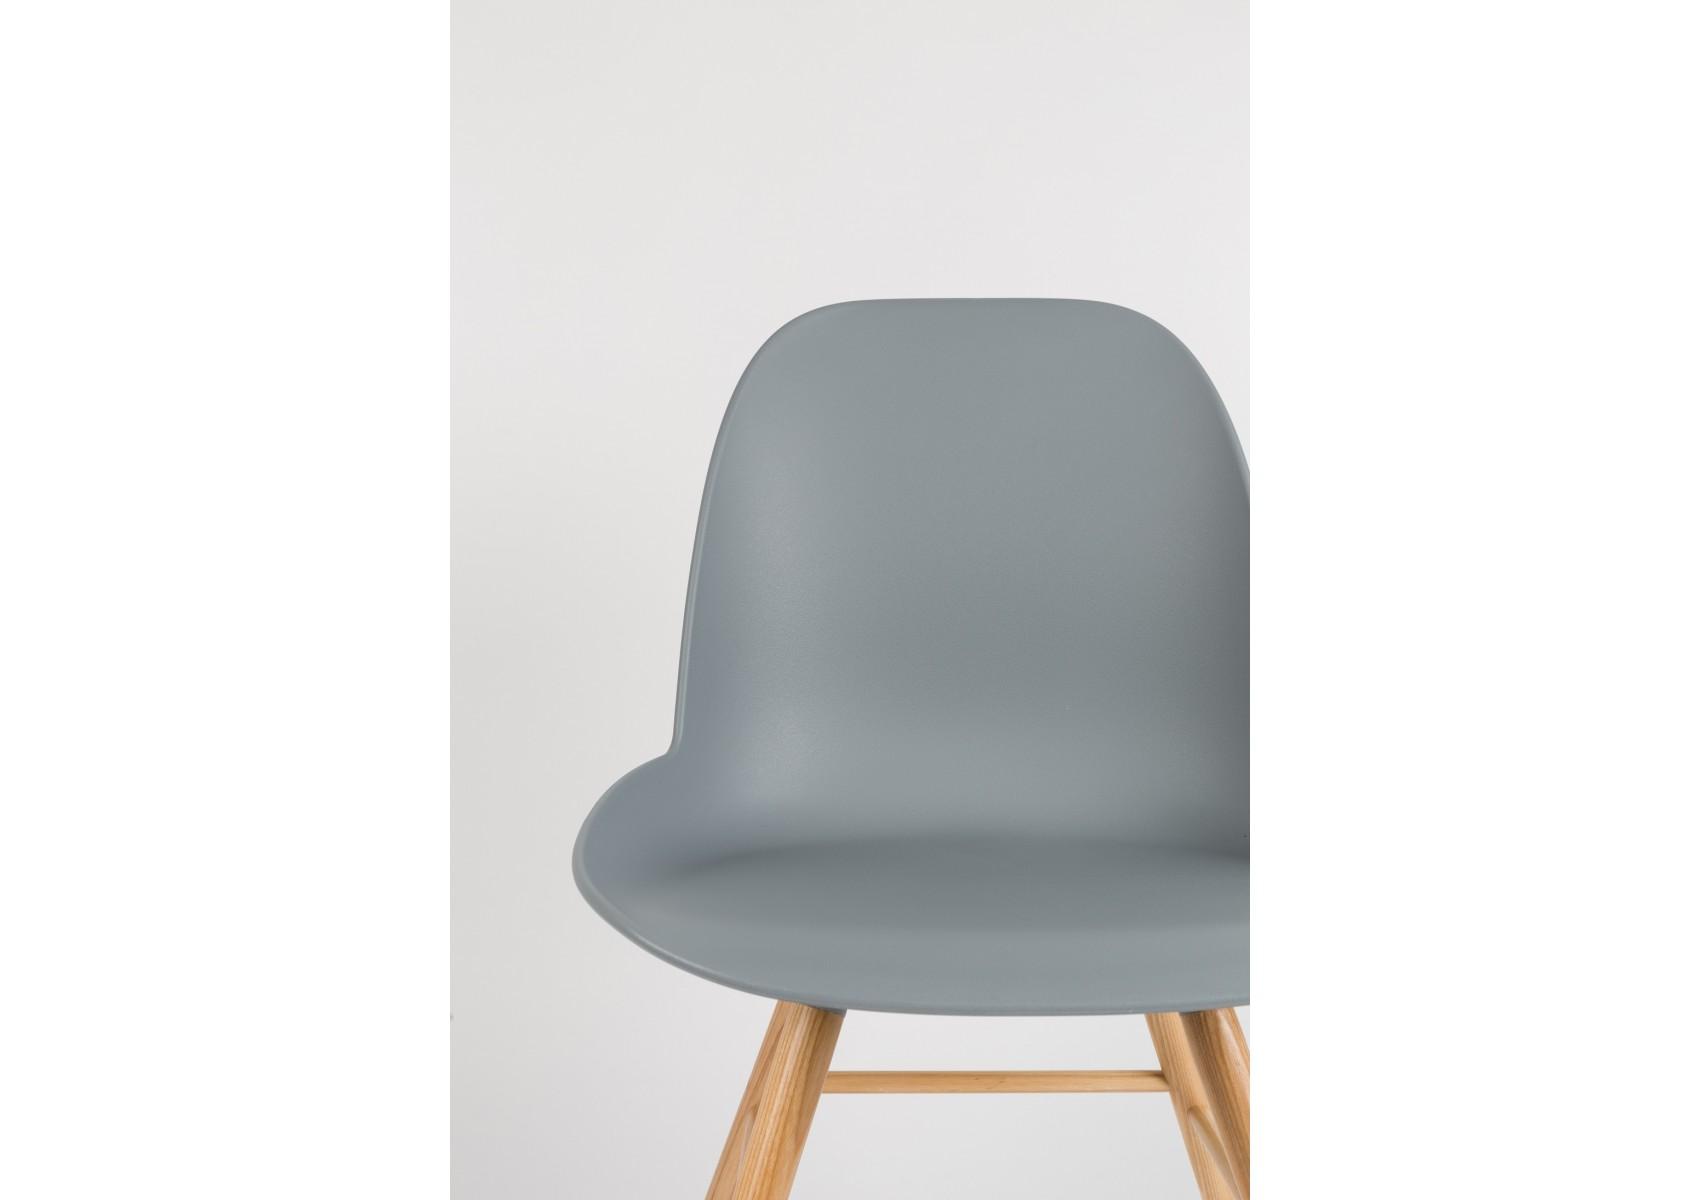 chaise scandinave albert kuip chaise design avec pieds On chaise avec pied bois